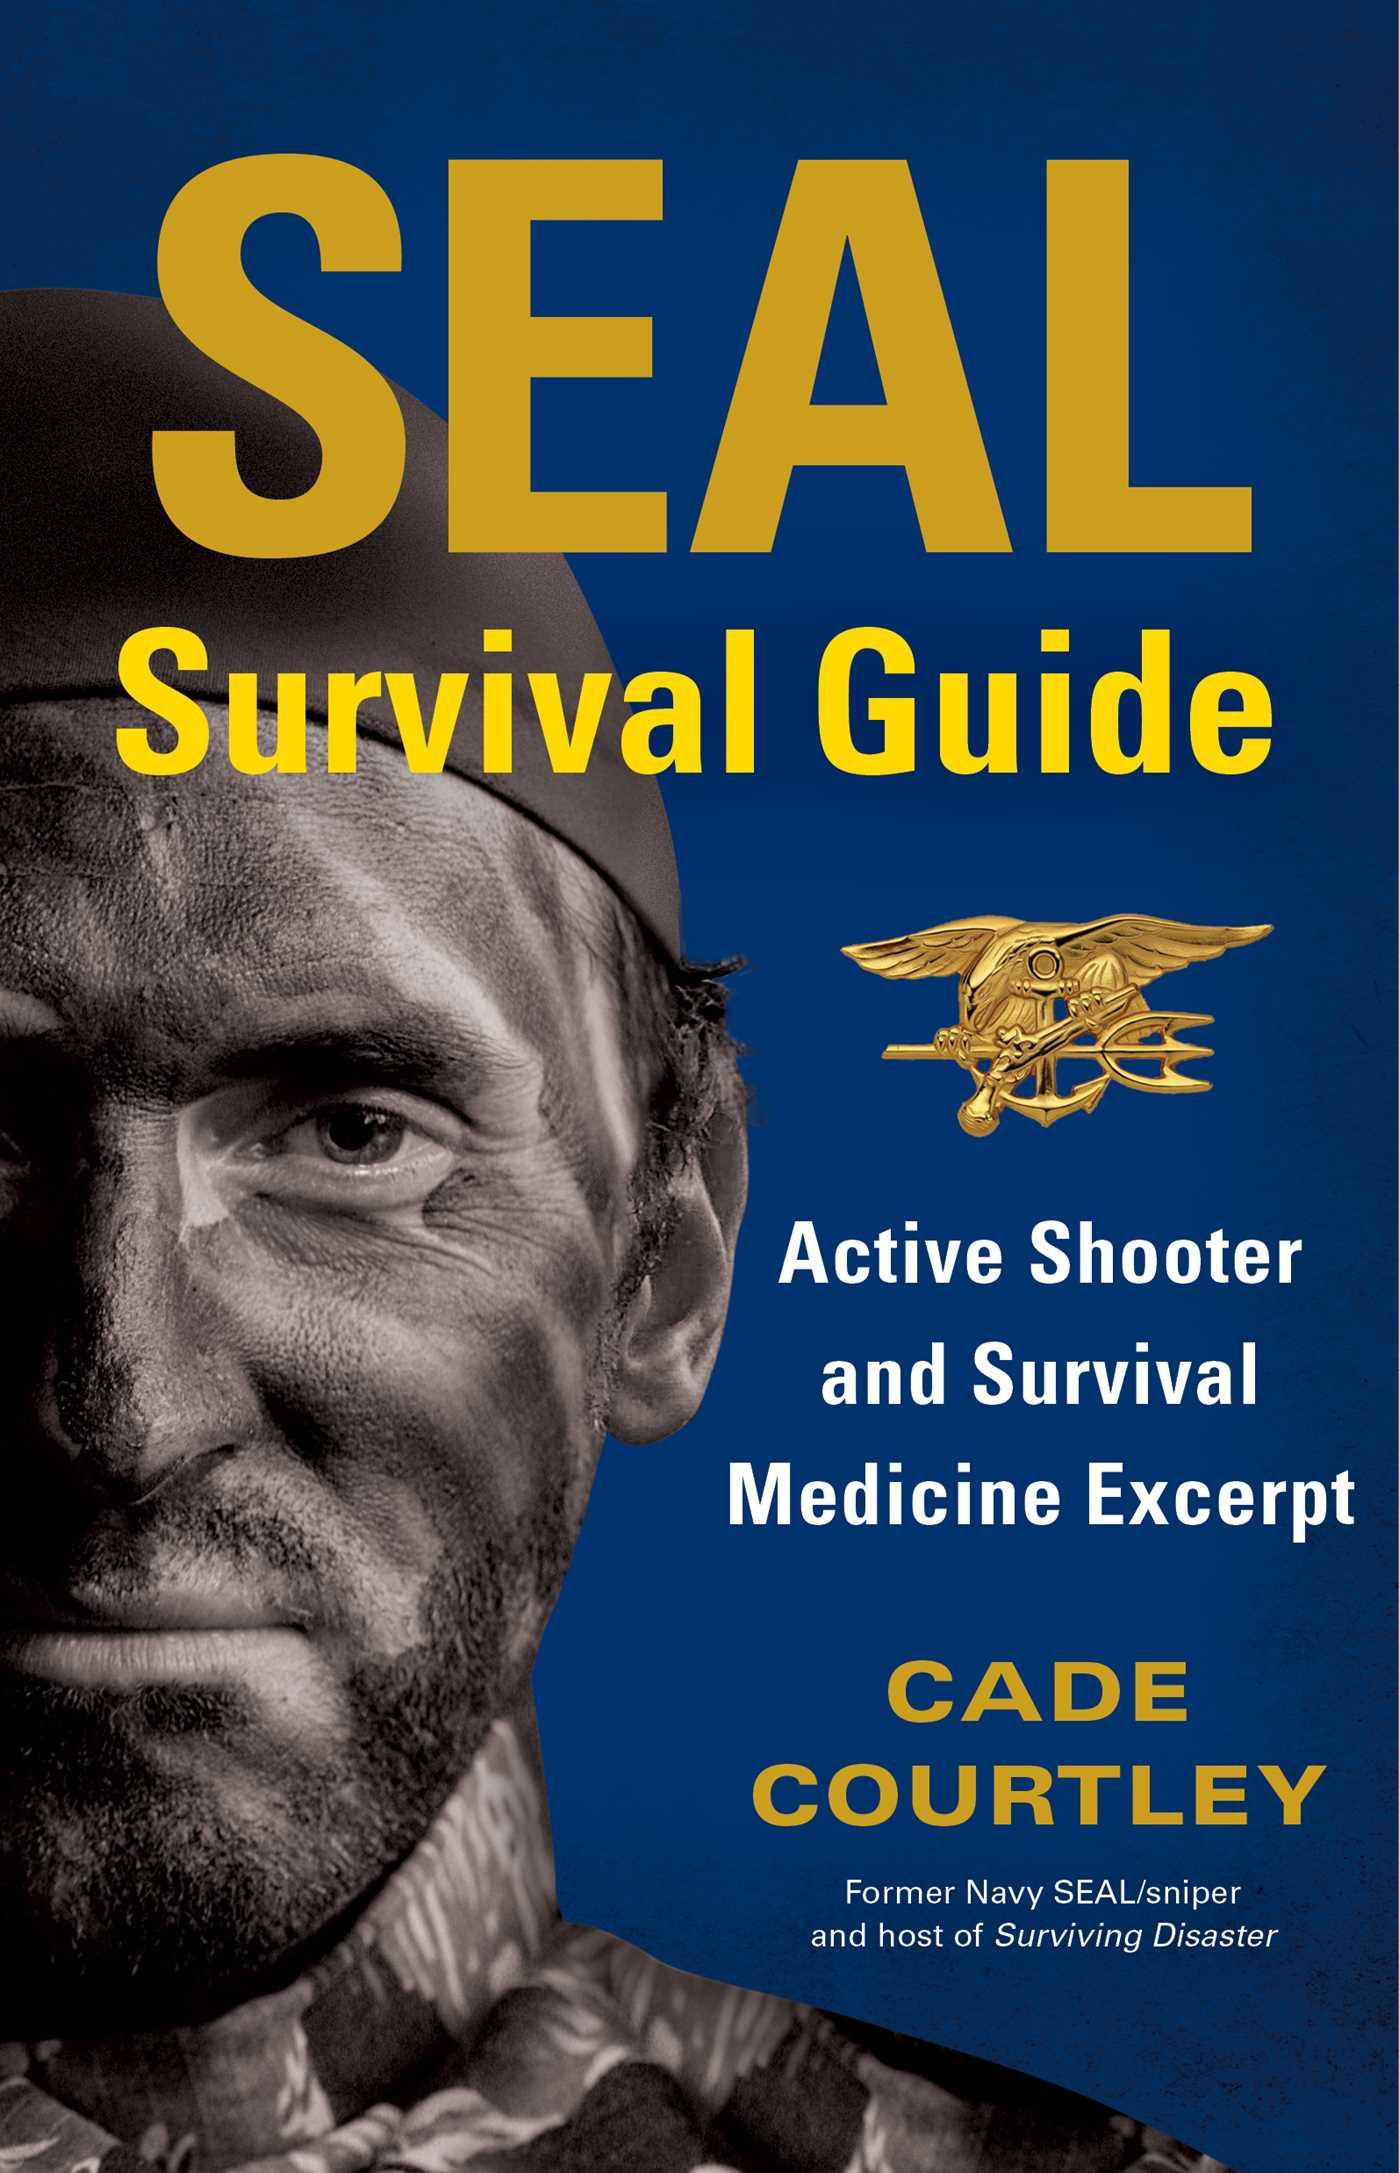 Seal survival guide active shooter and survival medicine excerpt 9781501157745 hr